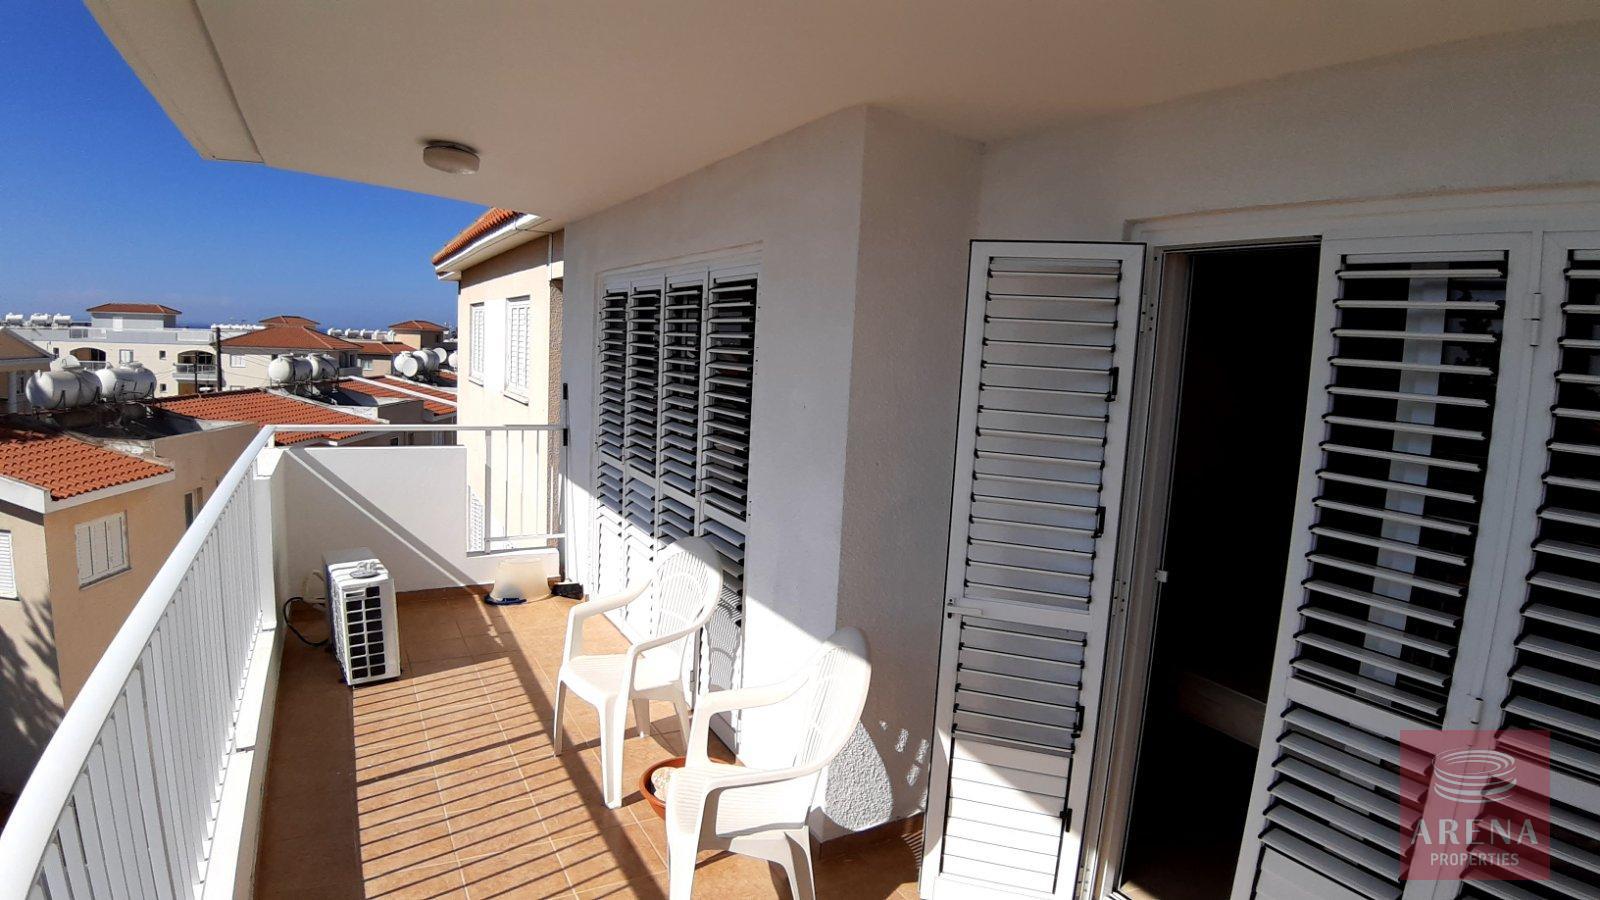 2 Bed Apt for rent in Paralimni - veranda